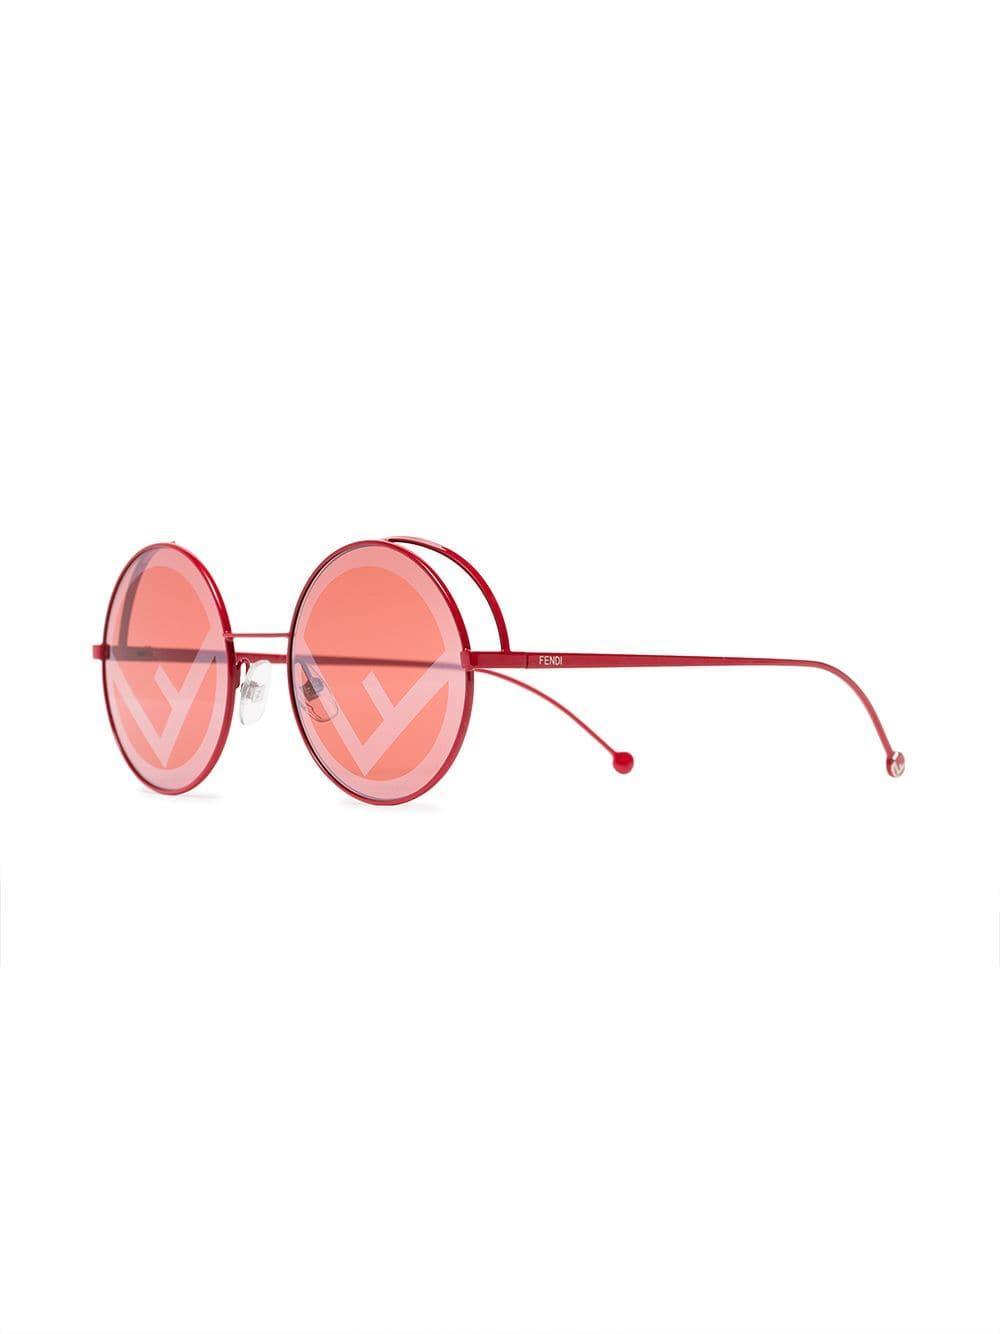 edb29b0257 Fendi - Red Logo Lens Round Sunglasses - Lyst. View fullscreen